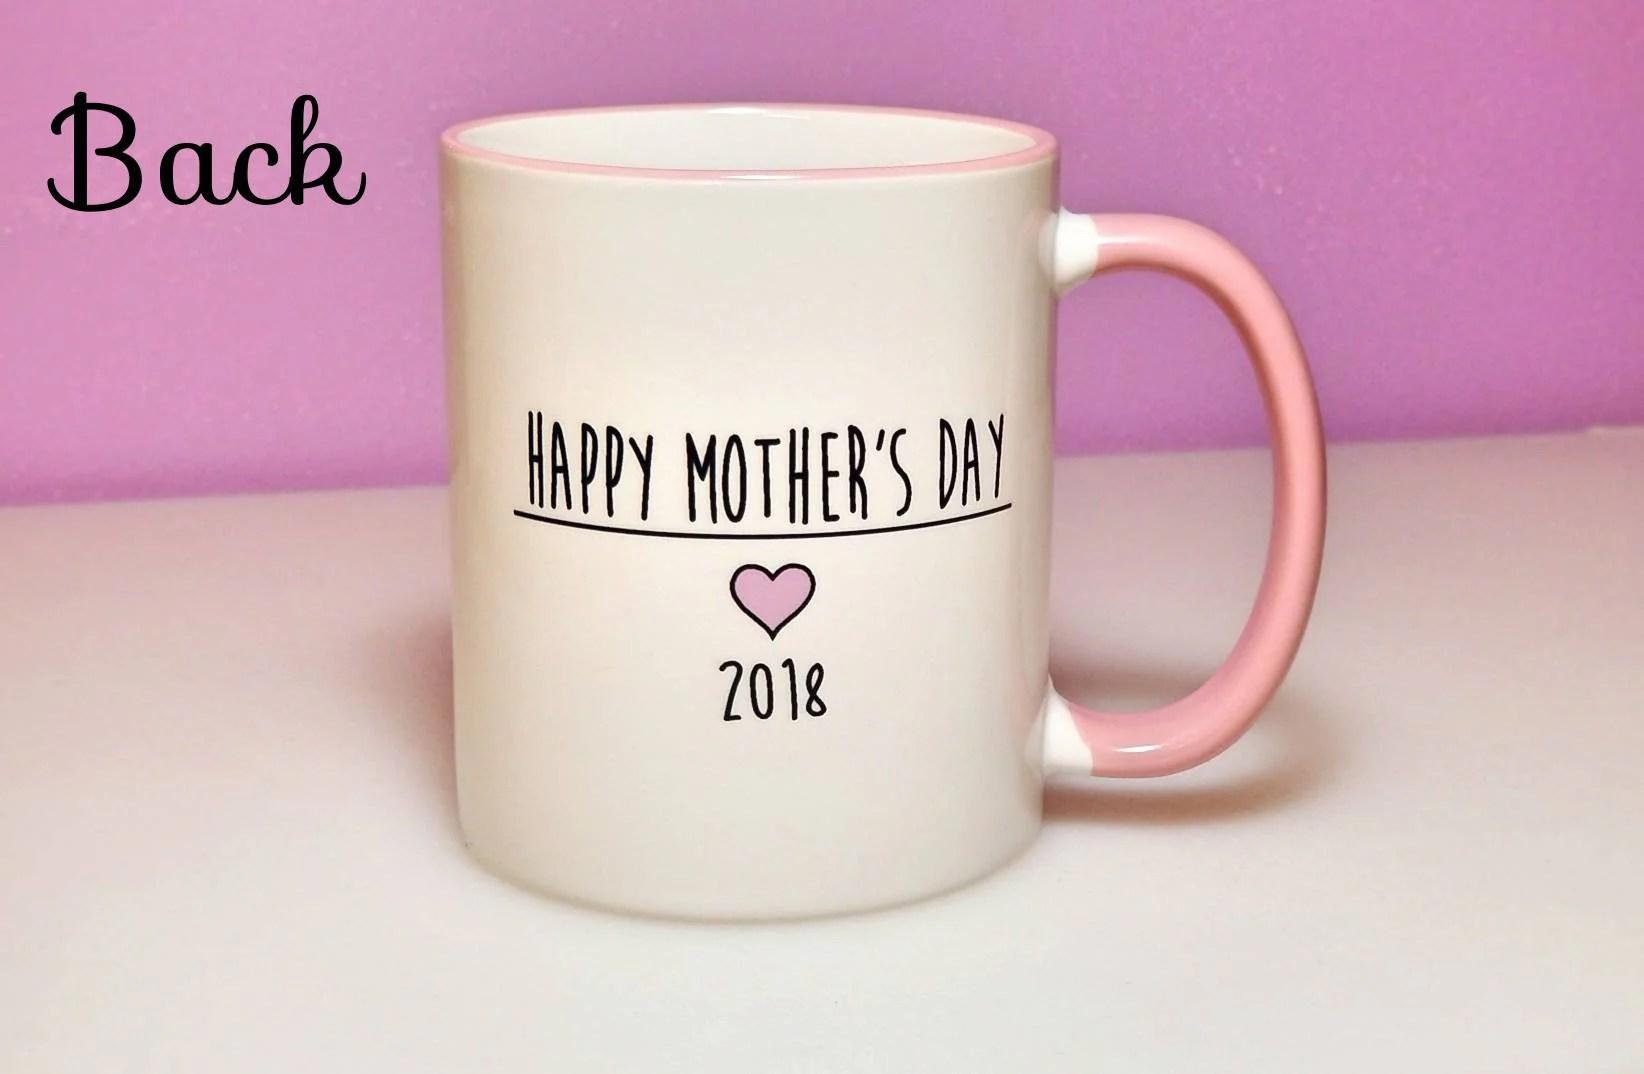 Bodacious Mom Mom Gift Birthdaygift Day Gift Coffee Mugs Mom Mom Gift Mom Mug Mom Coffee Mug Custom Mug Day Gift Coffee Mugs Mom Mom Gift furniture Cute Coffee Cups